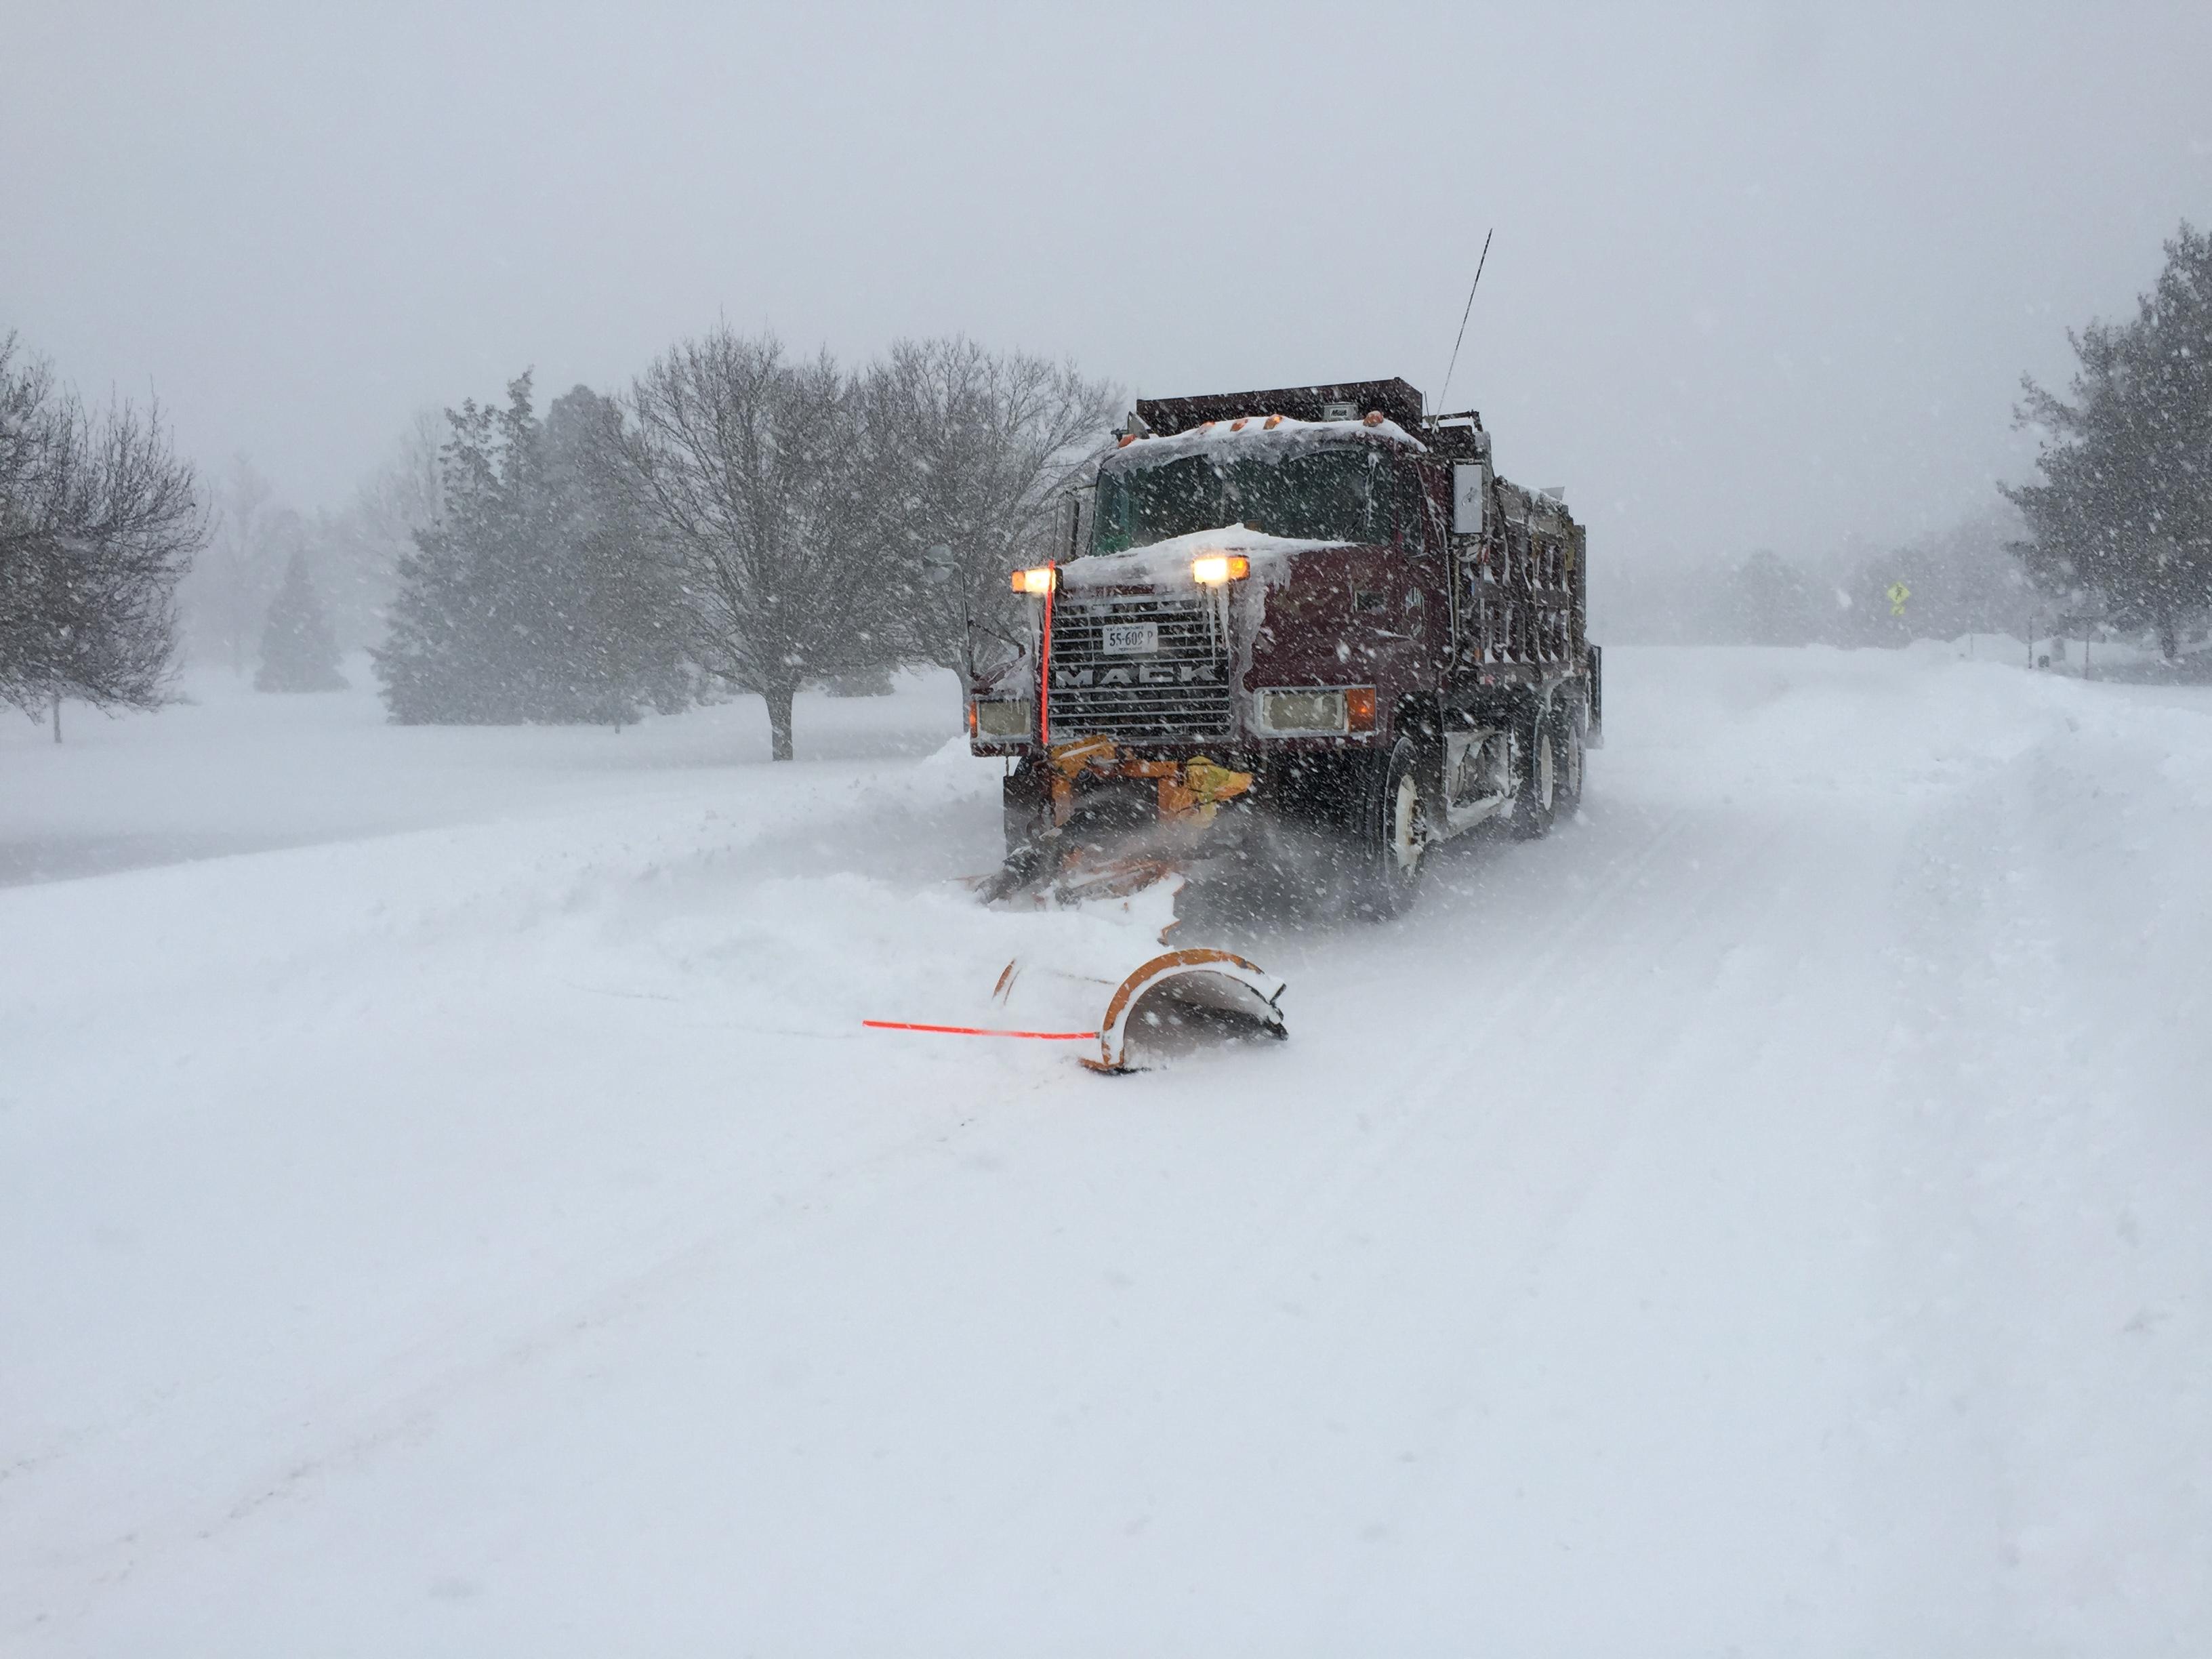 File:2016-01-23 16 20 20 A snow plow along Franklin Farm ...